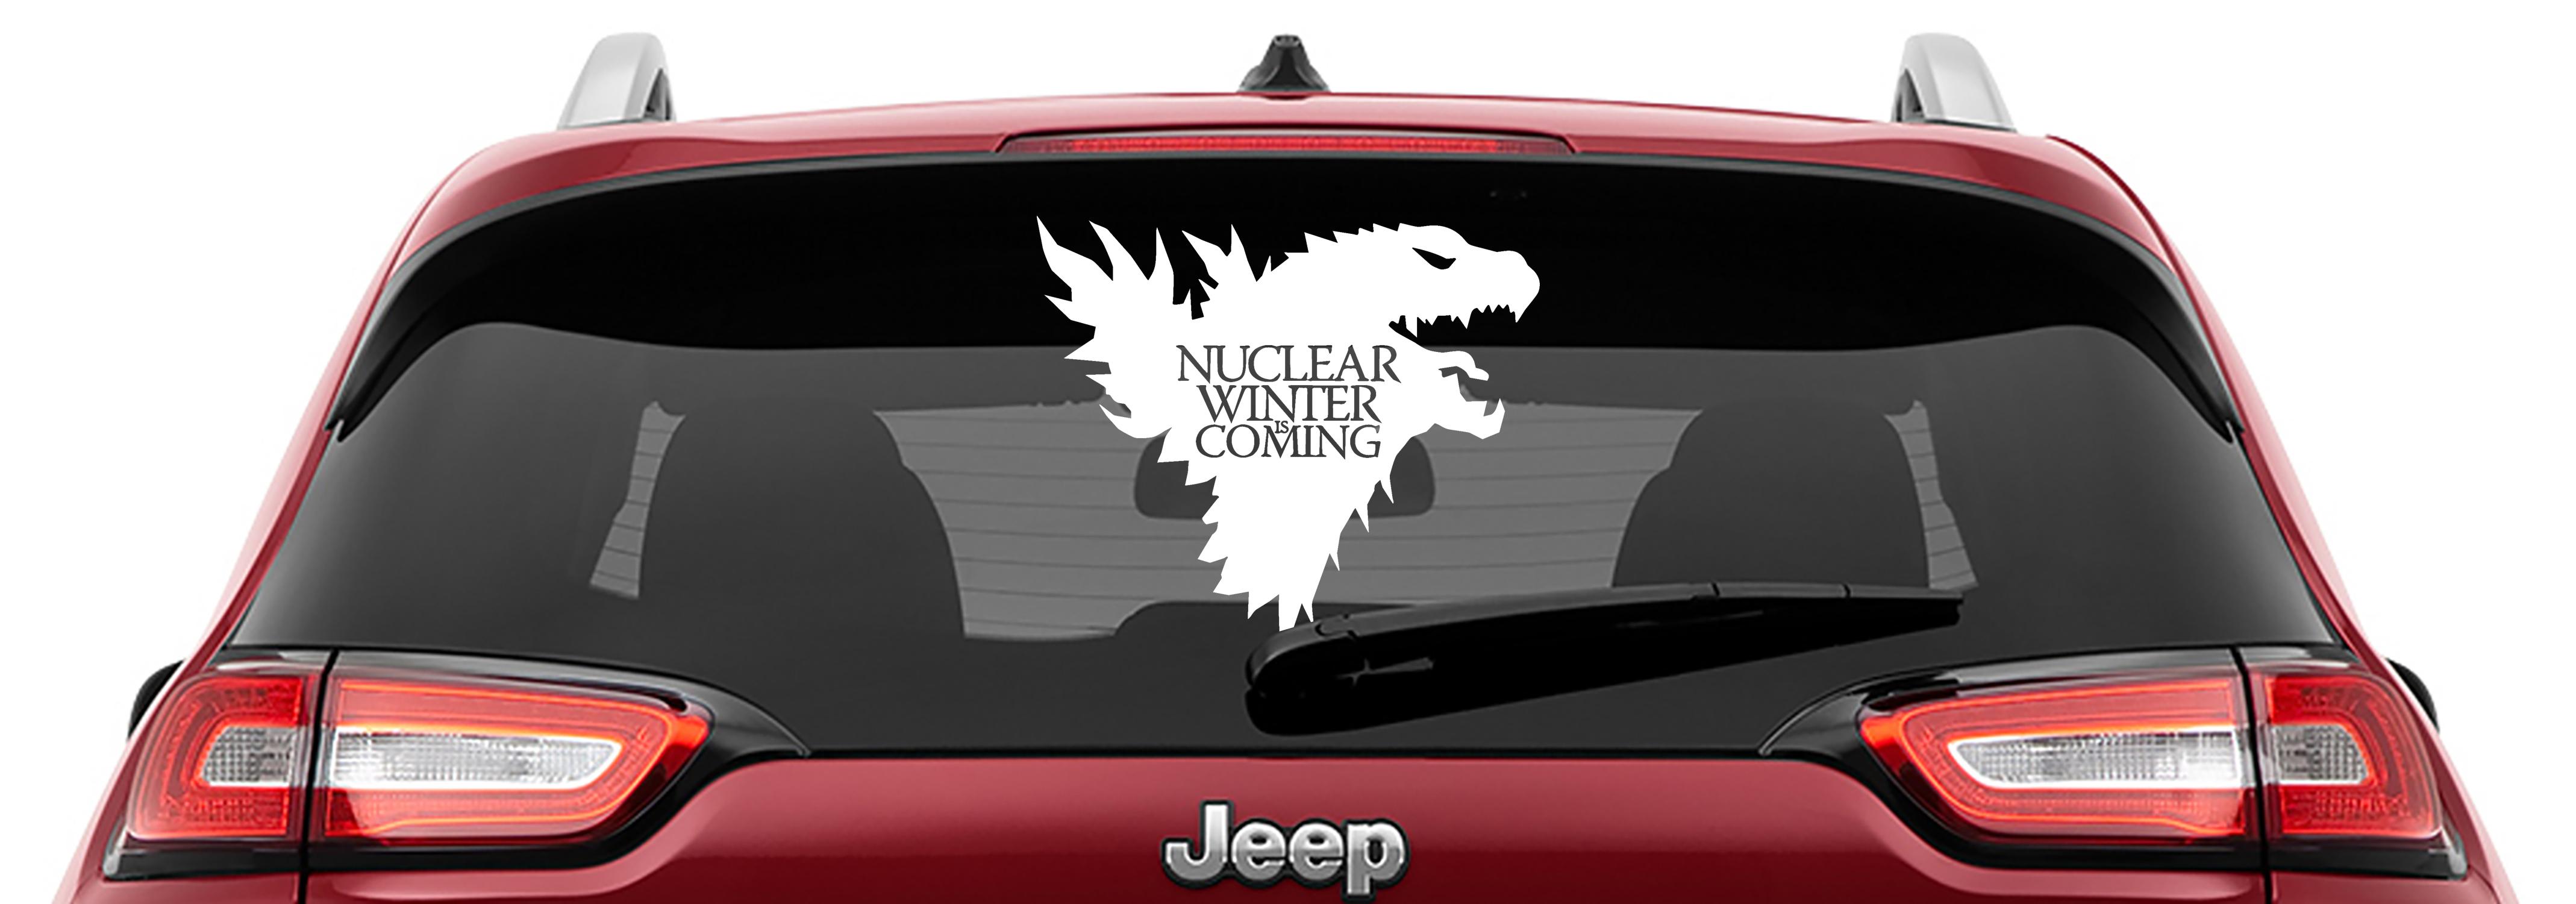 Godzilla Nuclear Winter is Coming Vinyl DecalGodzilla Game of Thrones Parody